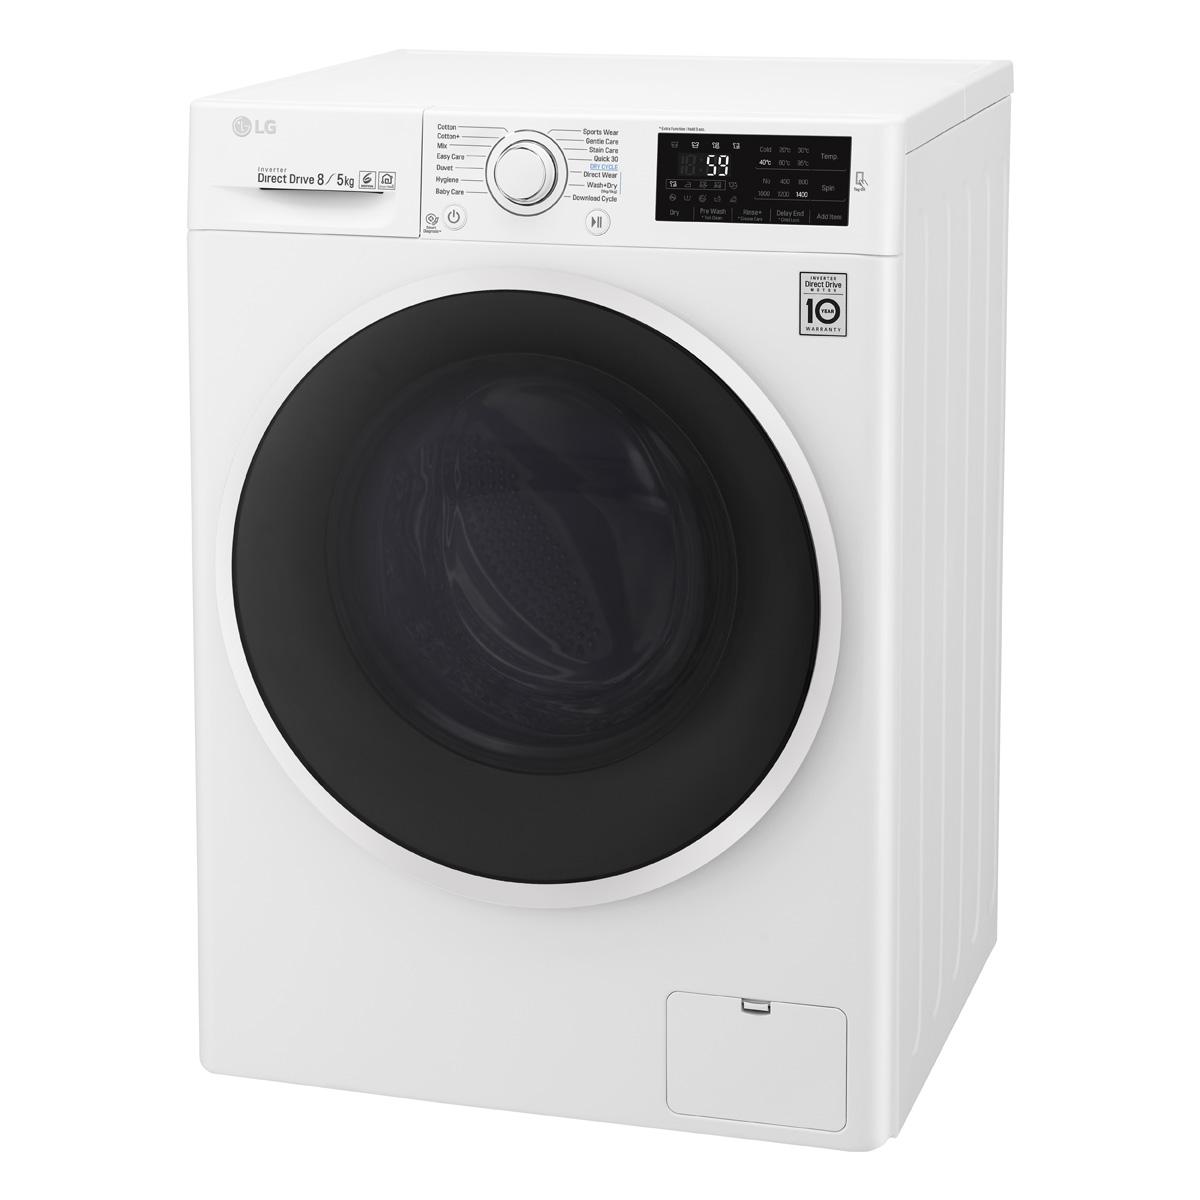 aeg kuivaava pesukone lämpöpumppu